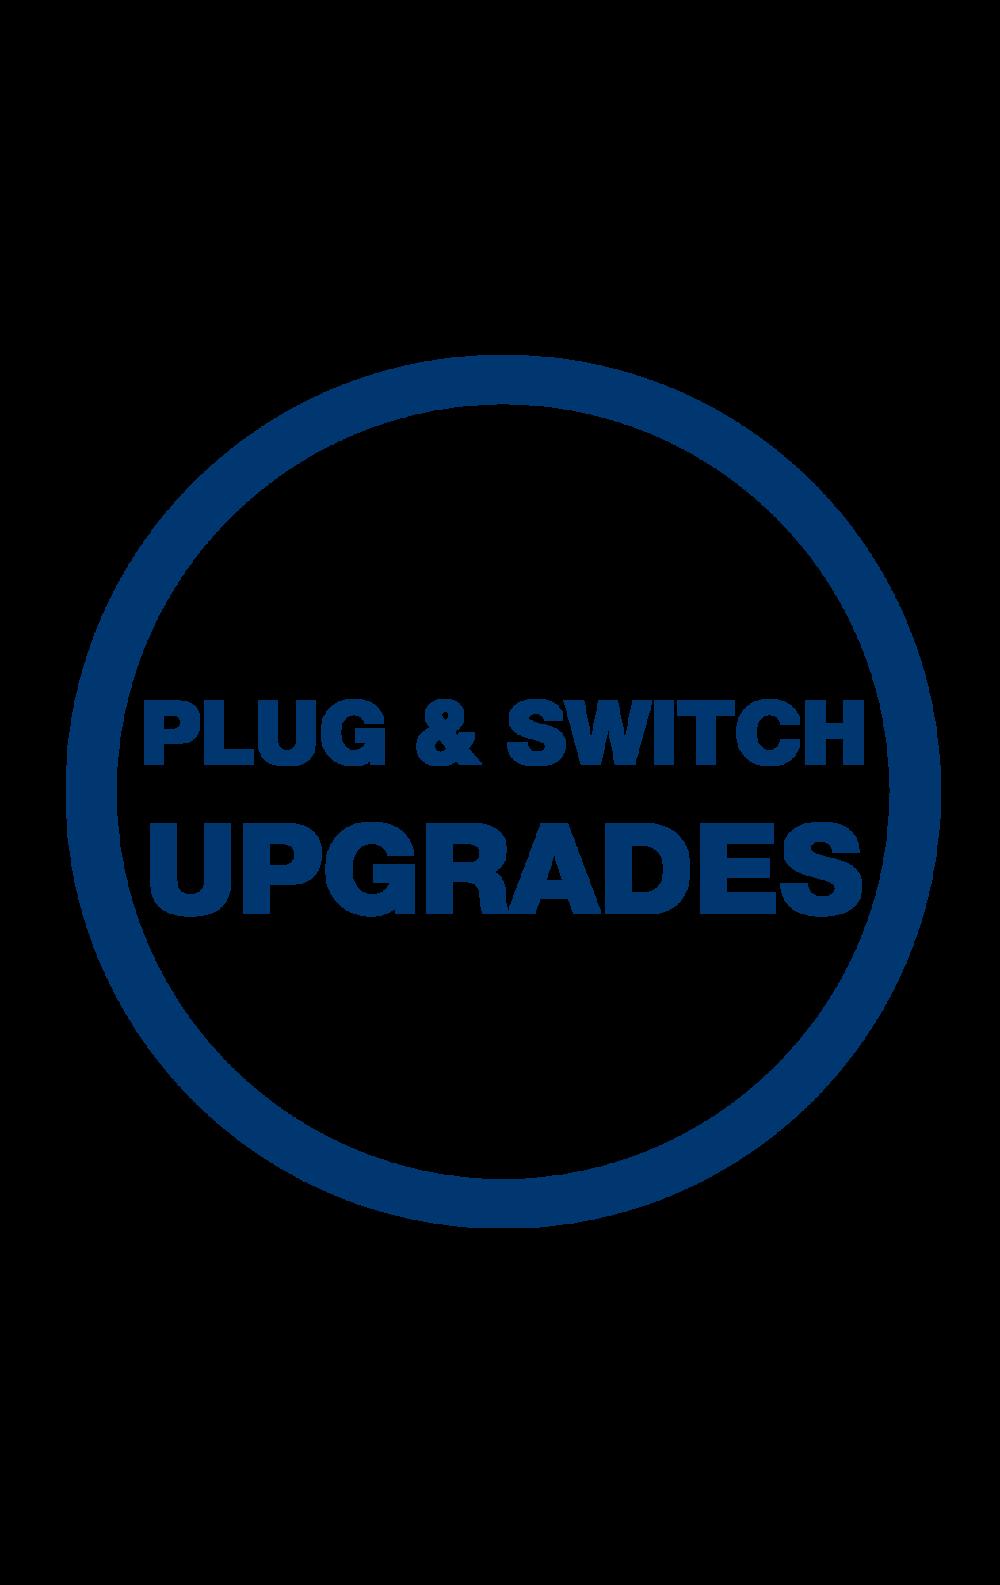 plug-n-switch-2.png